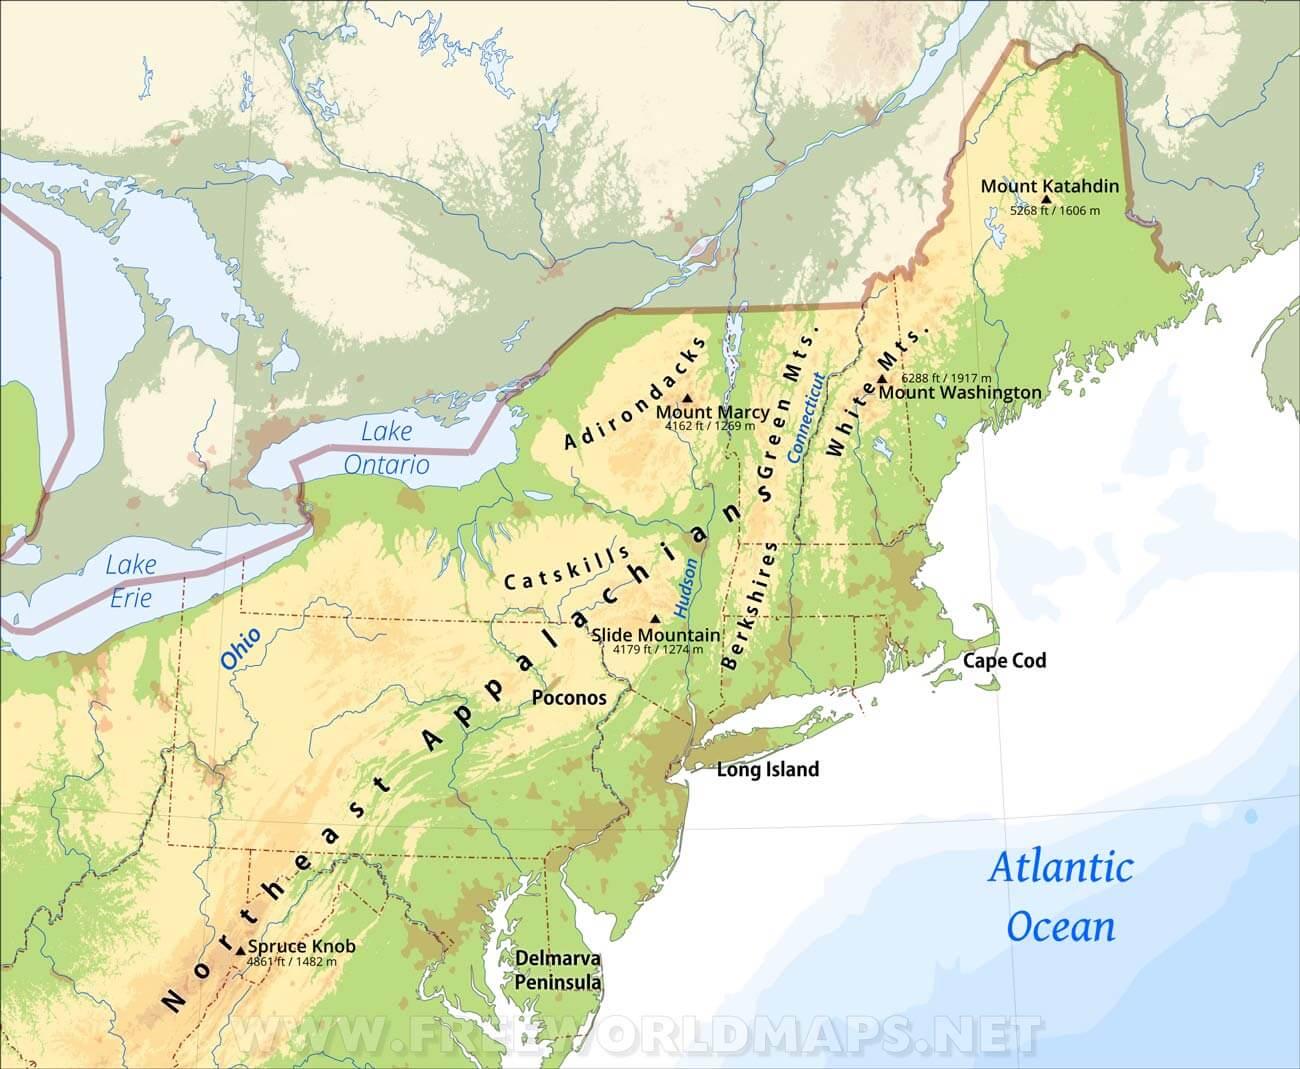 Boston To Toronto LTL Shipping Canada USA Cross Border Transport - Northeast of usa map